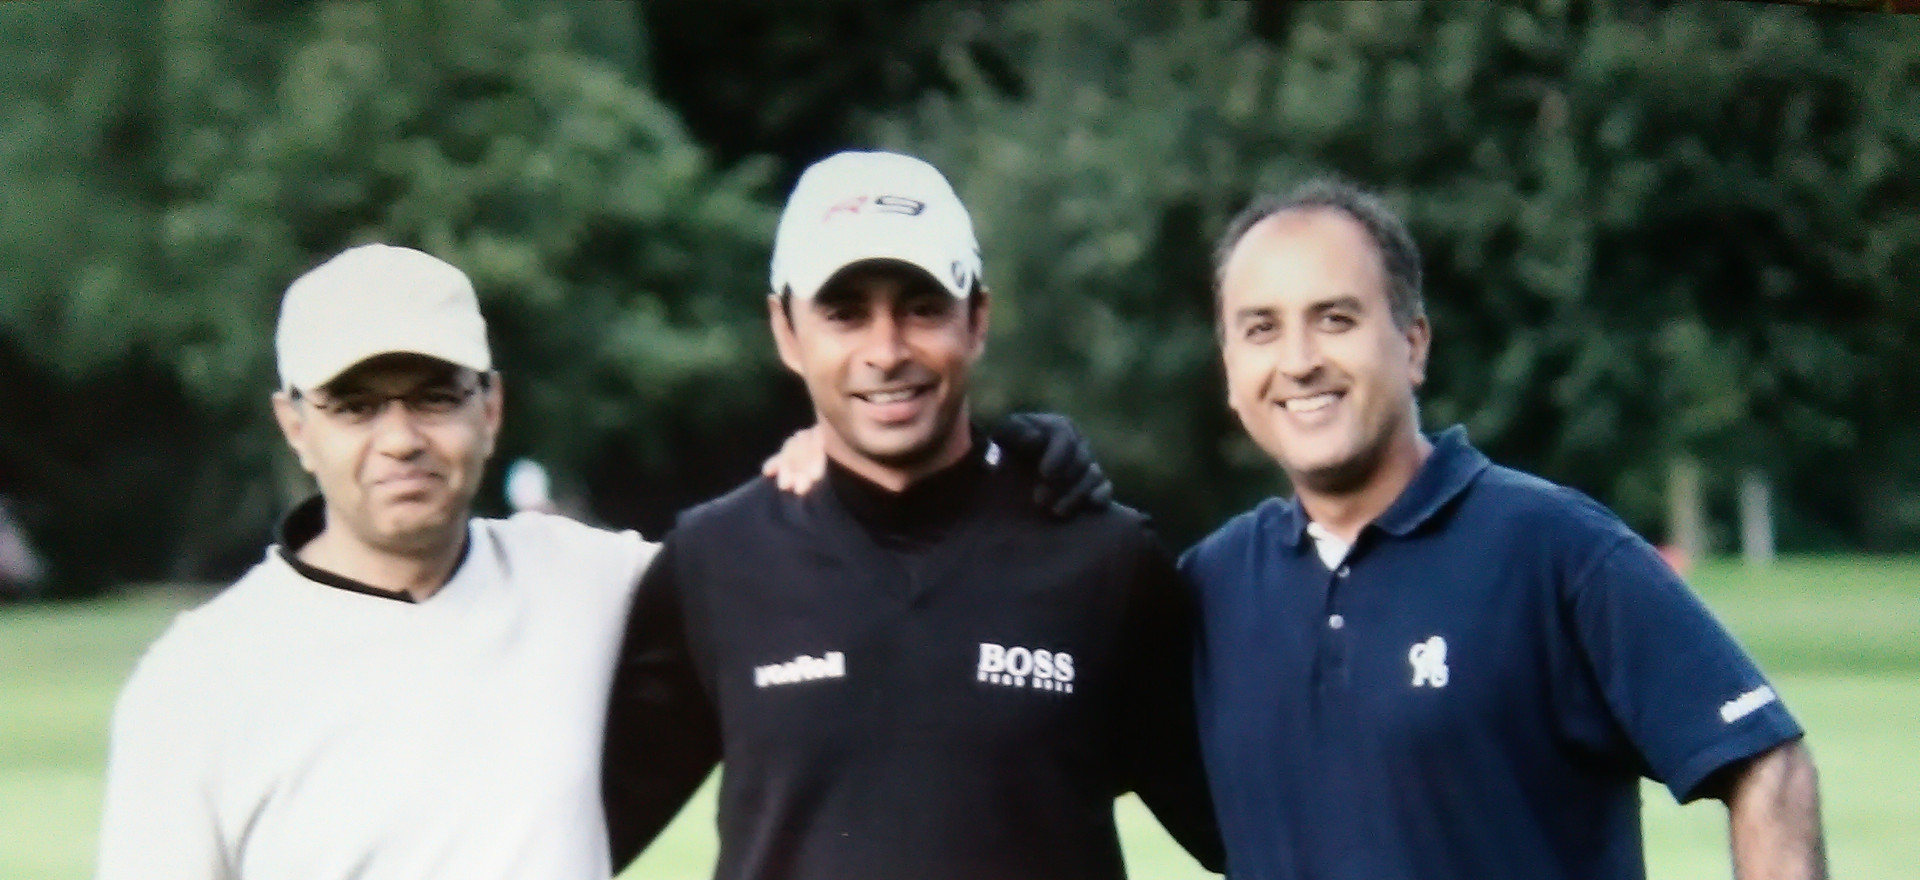 Tour Pro Jyoti Randhawa playing at Perivale Park Golf Course